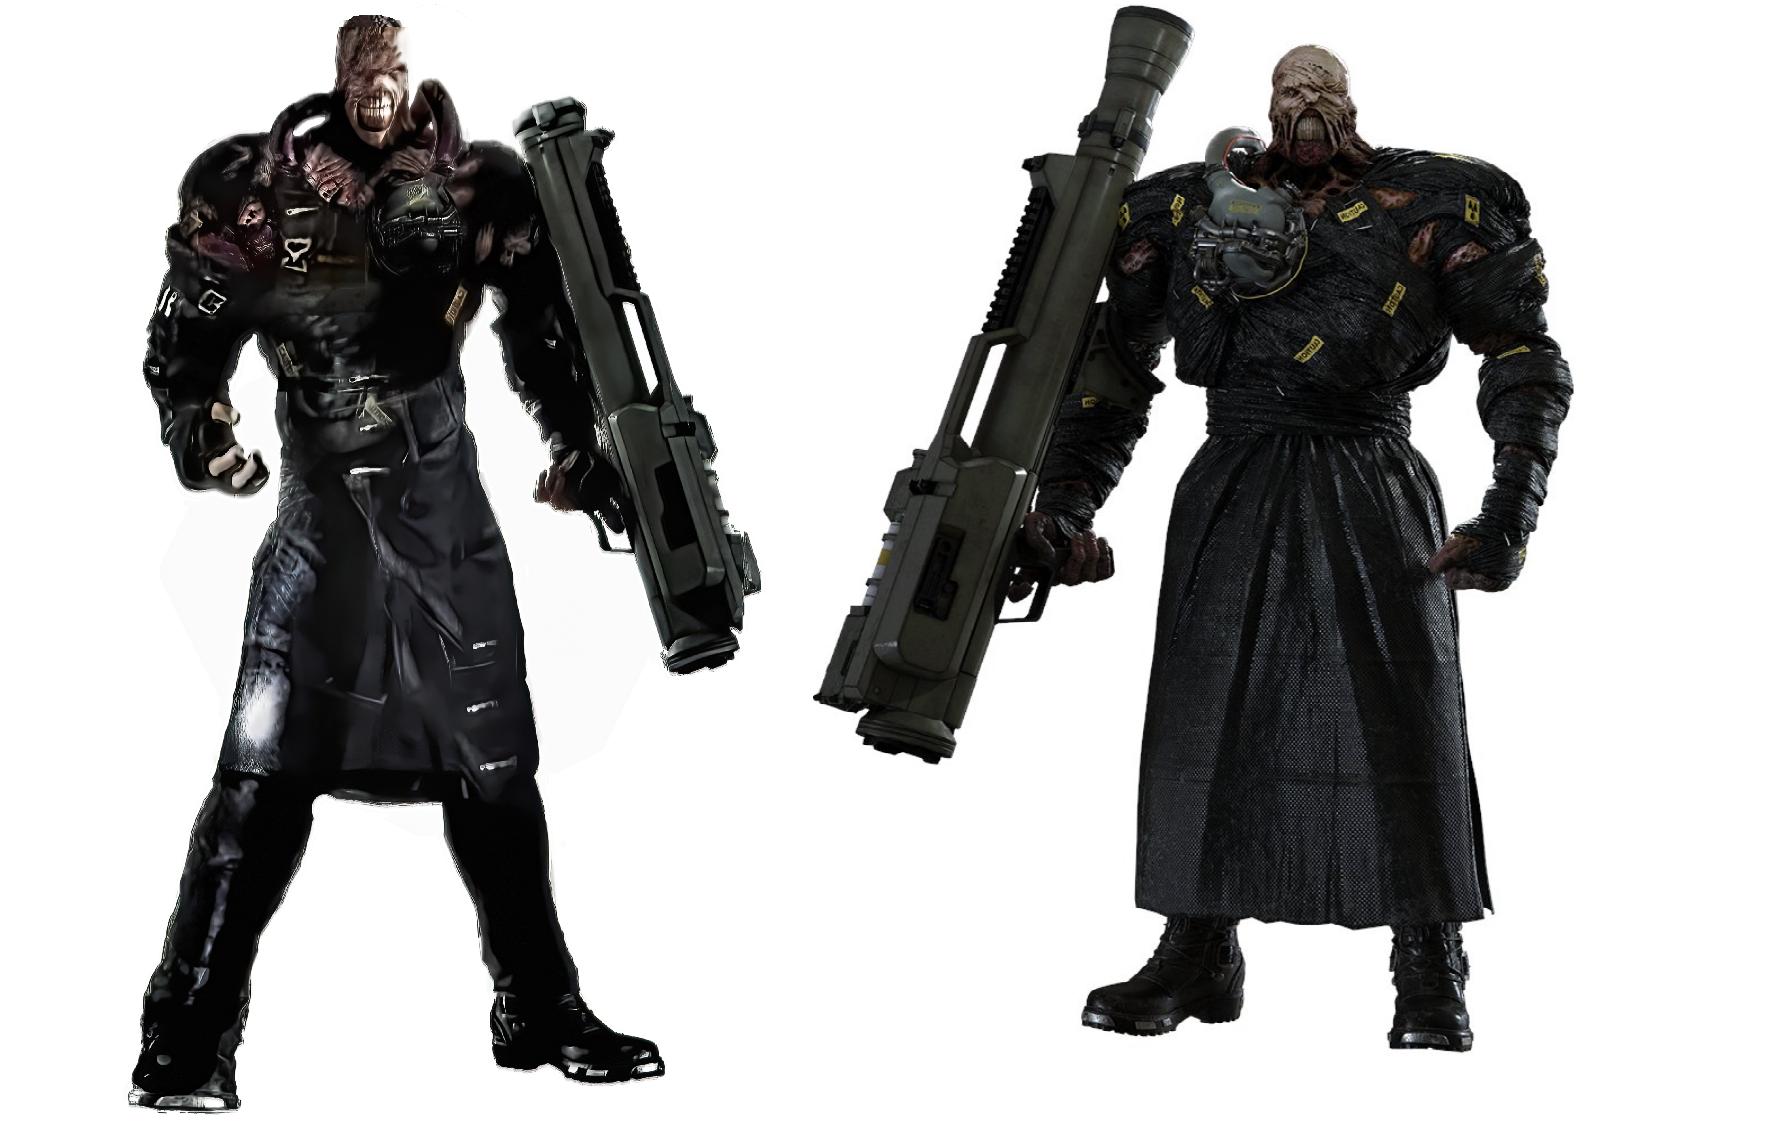 Resident Evil 3 Nemesis Remake Vidrax Concept By Jaoks On Deviantart